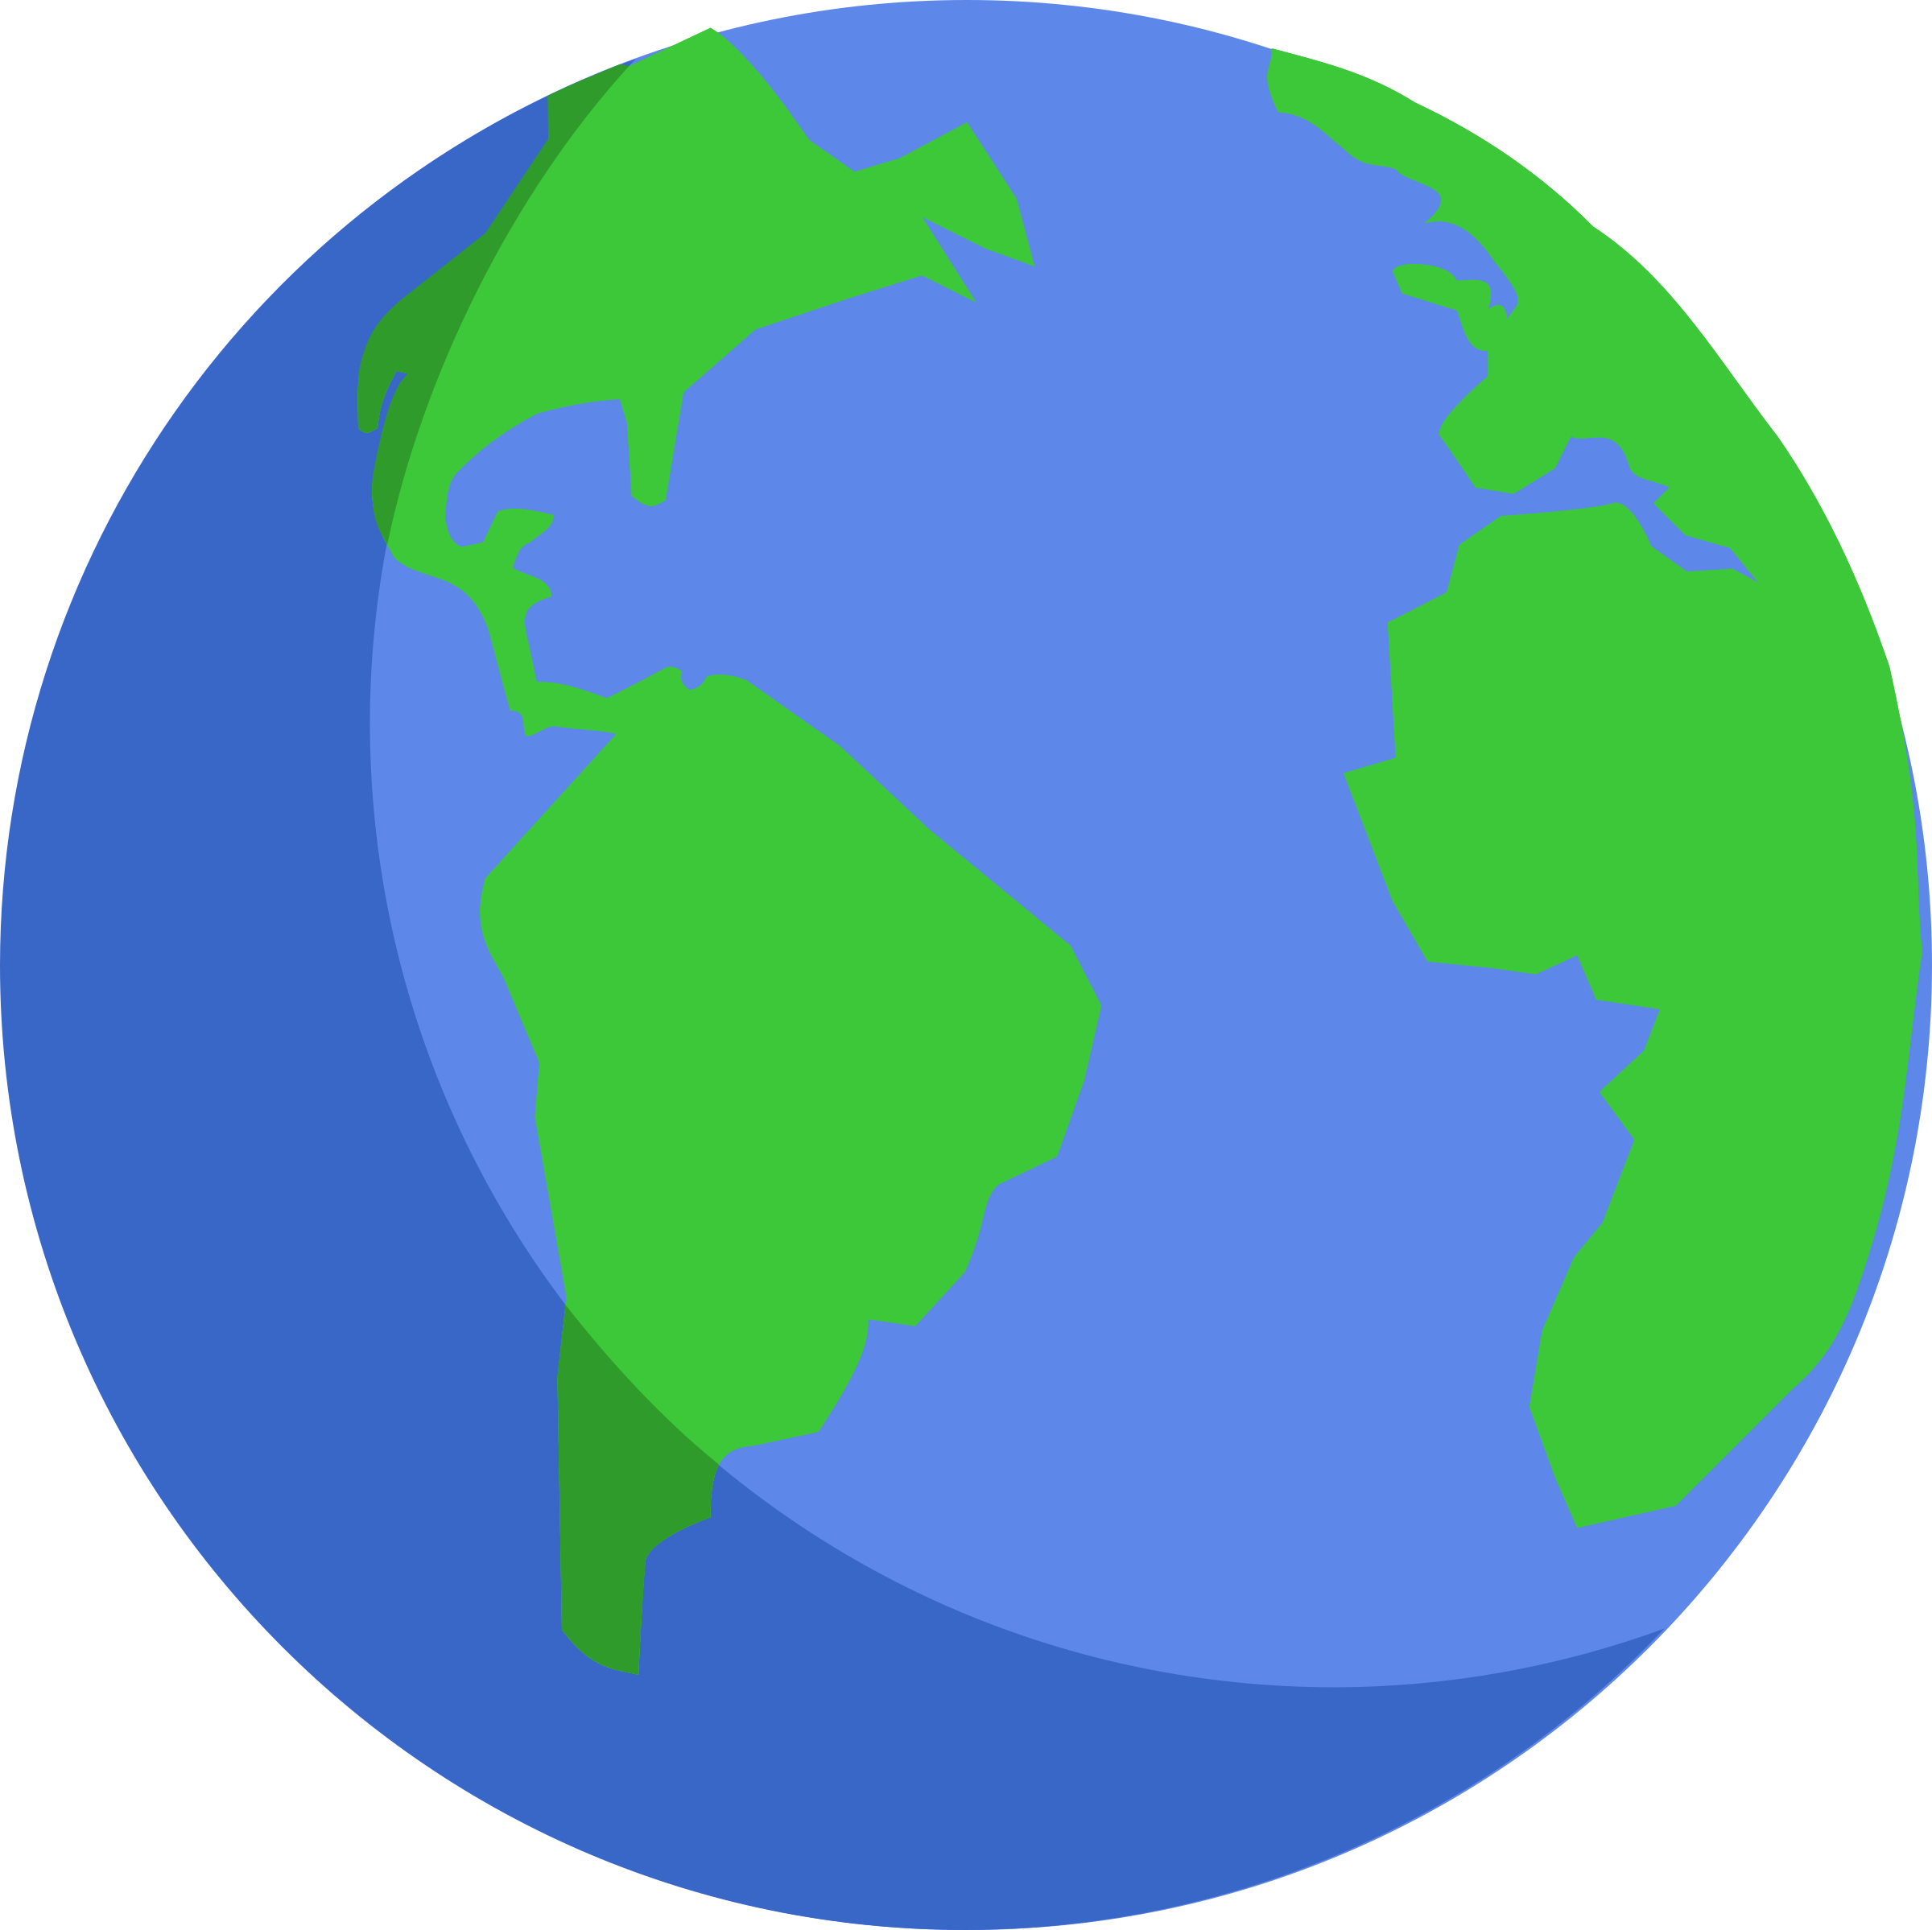 Free Clip Art Earth, Download Free Clip Art, Free Clip Art.